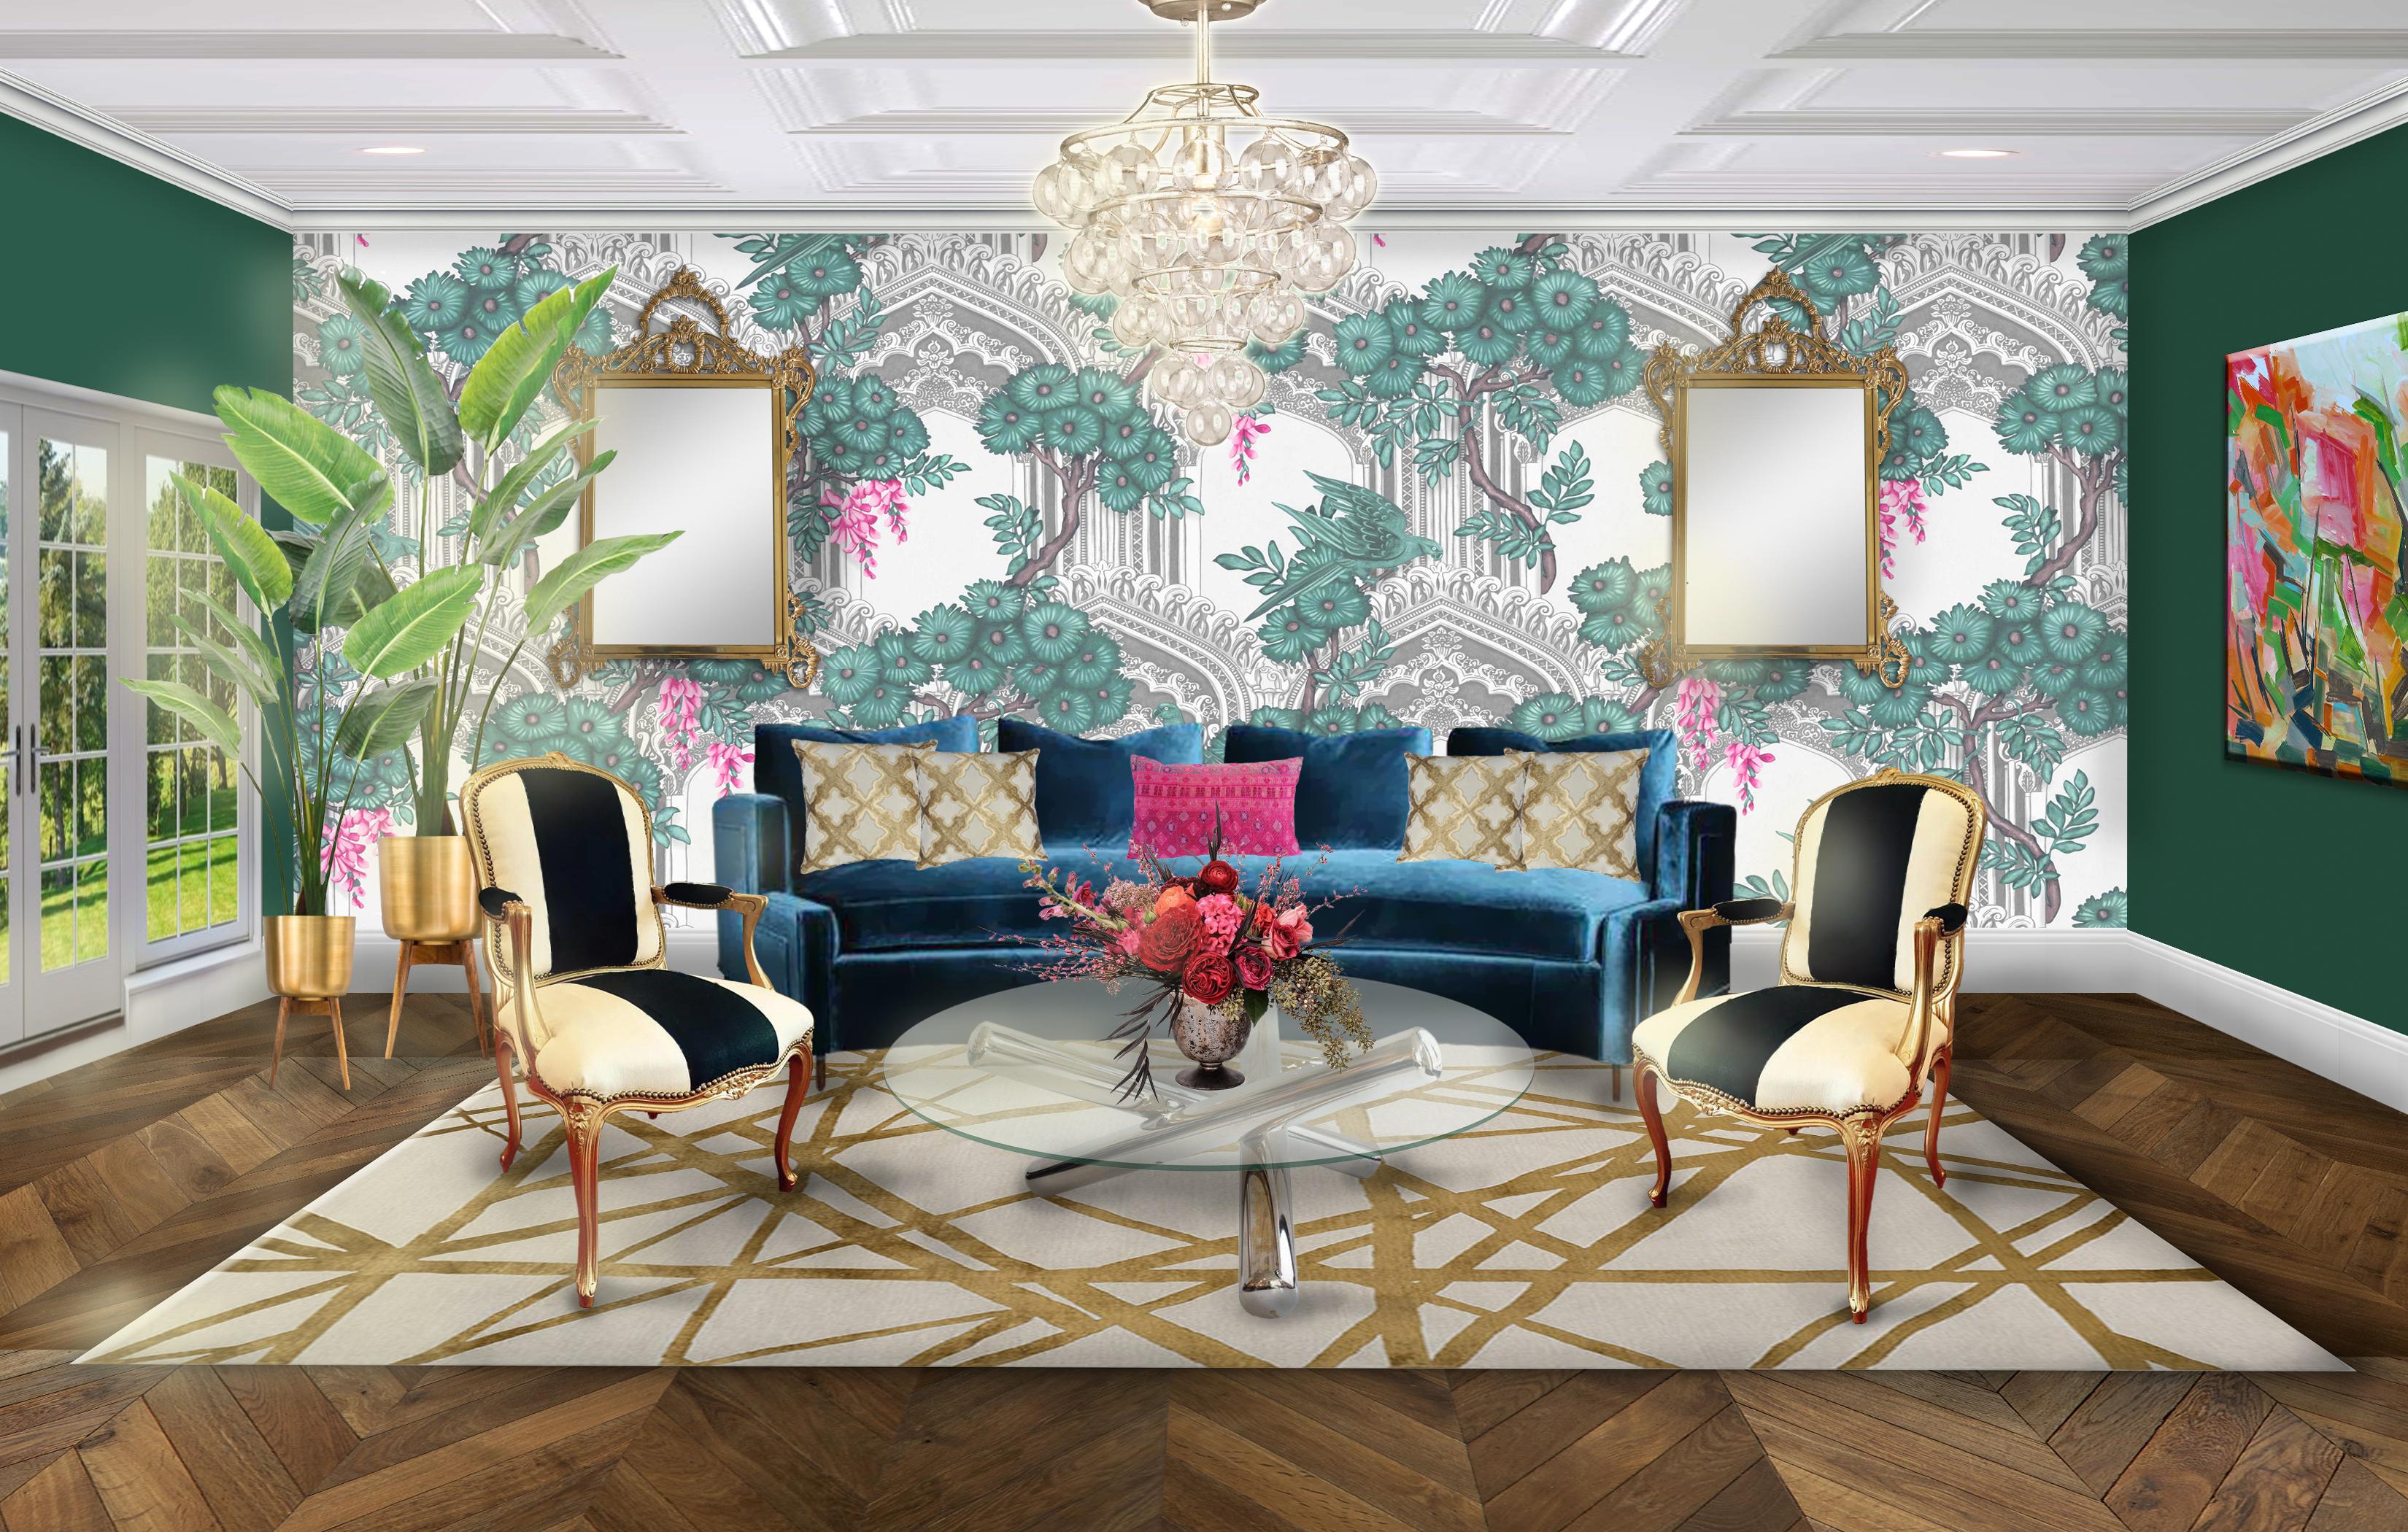 Amazing AW Design Studio Interior Design Dallas. FloorPlanAWdesignStudioDallas.  ISl6fm39qbz1oo1000000000